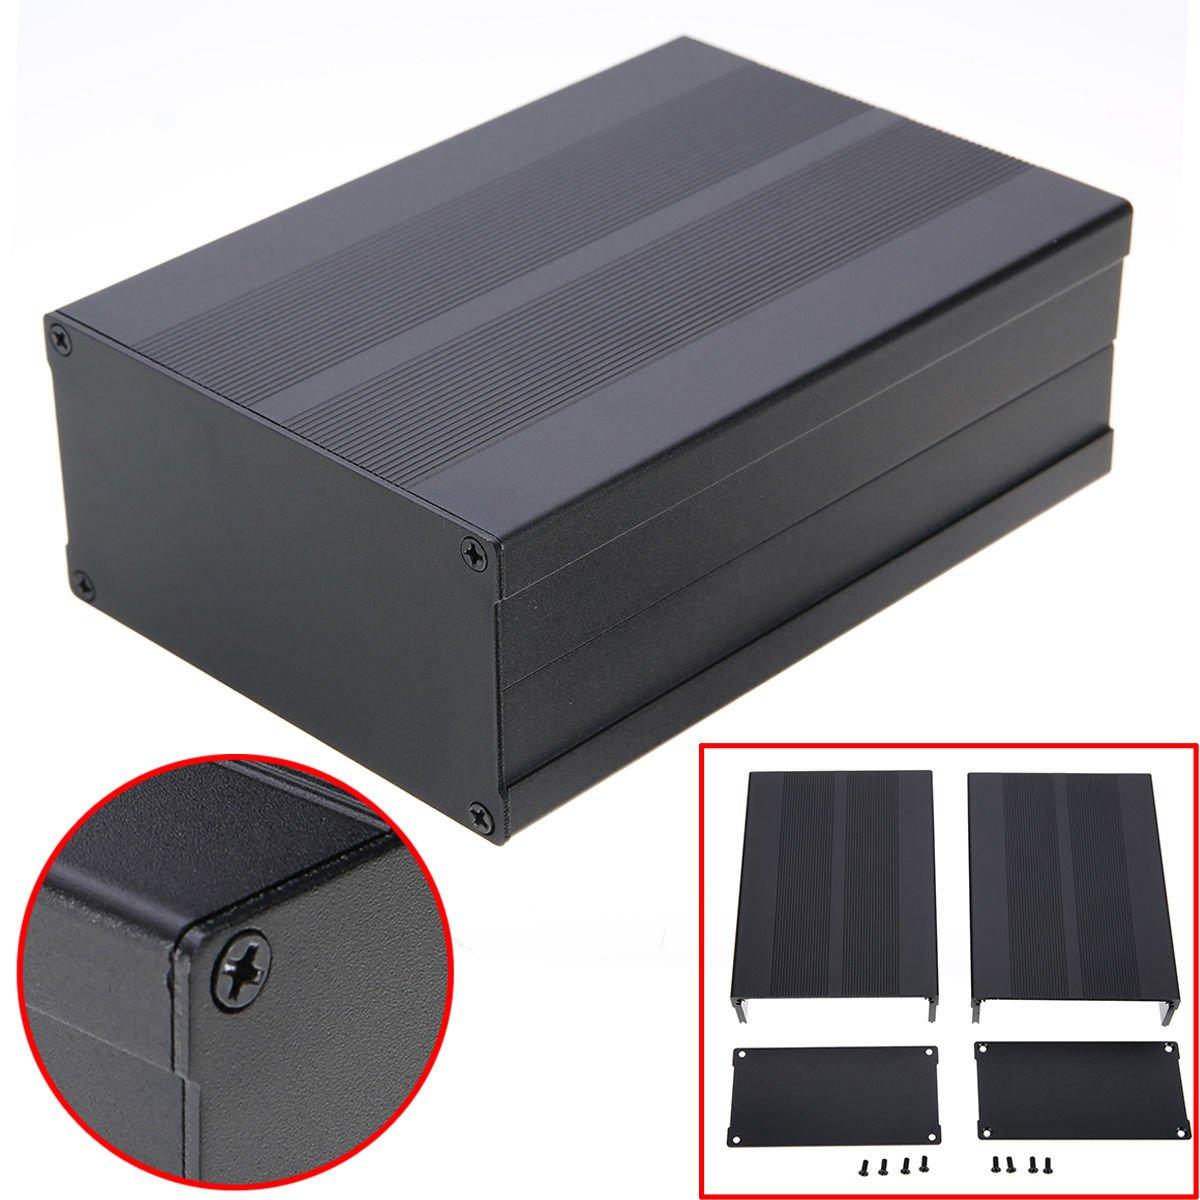 Enclosure Case Aluminum Box,DIY Enclosure Case Aluminum Box Circuit Board Project Electronic 150X105X55MM By E-UNIONA